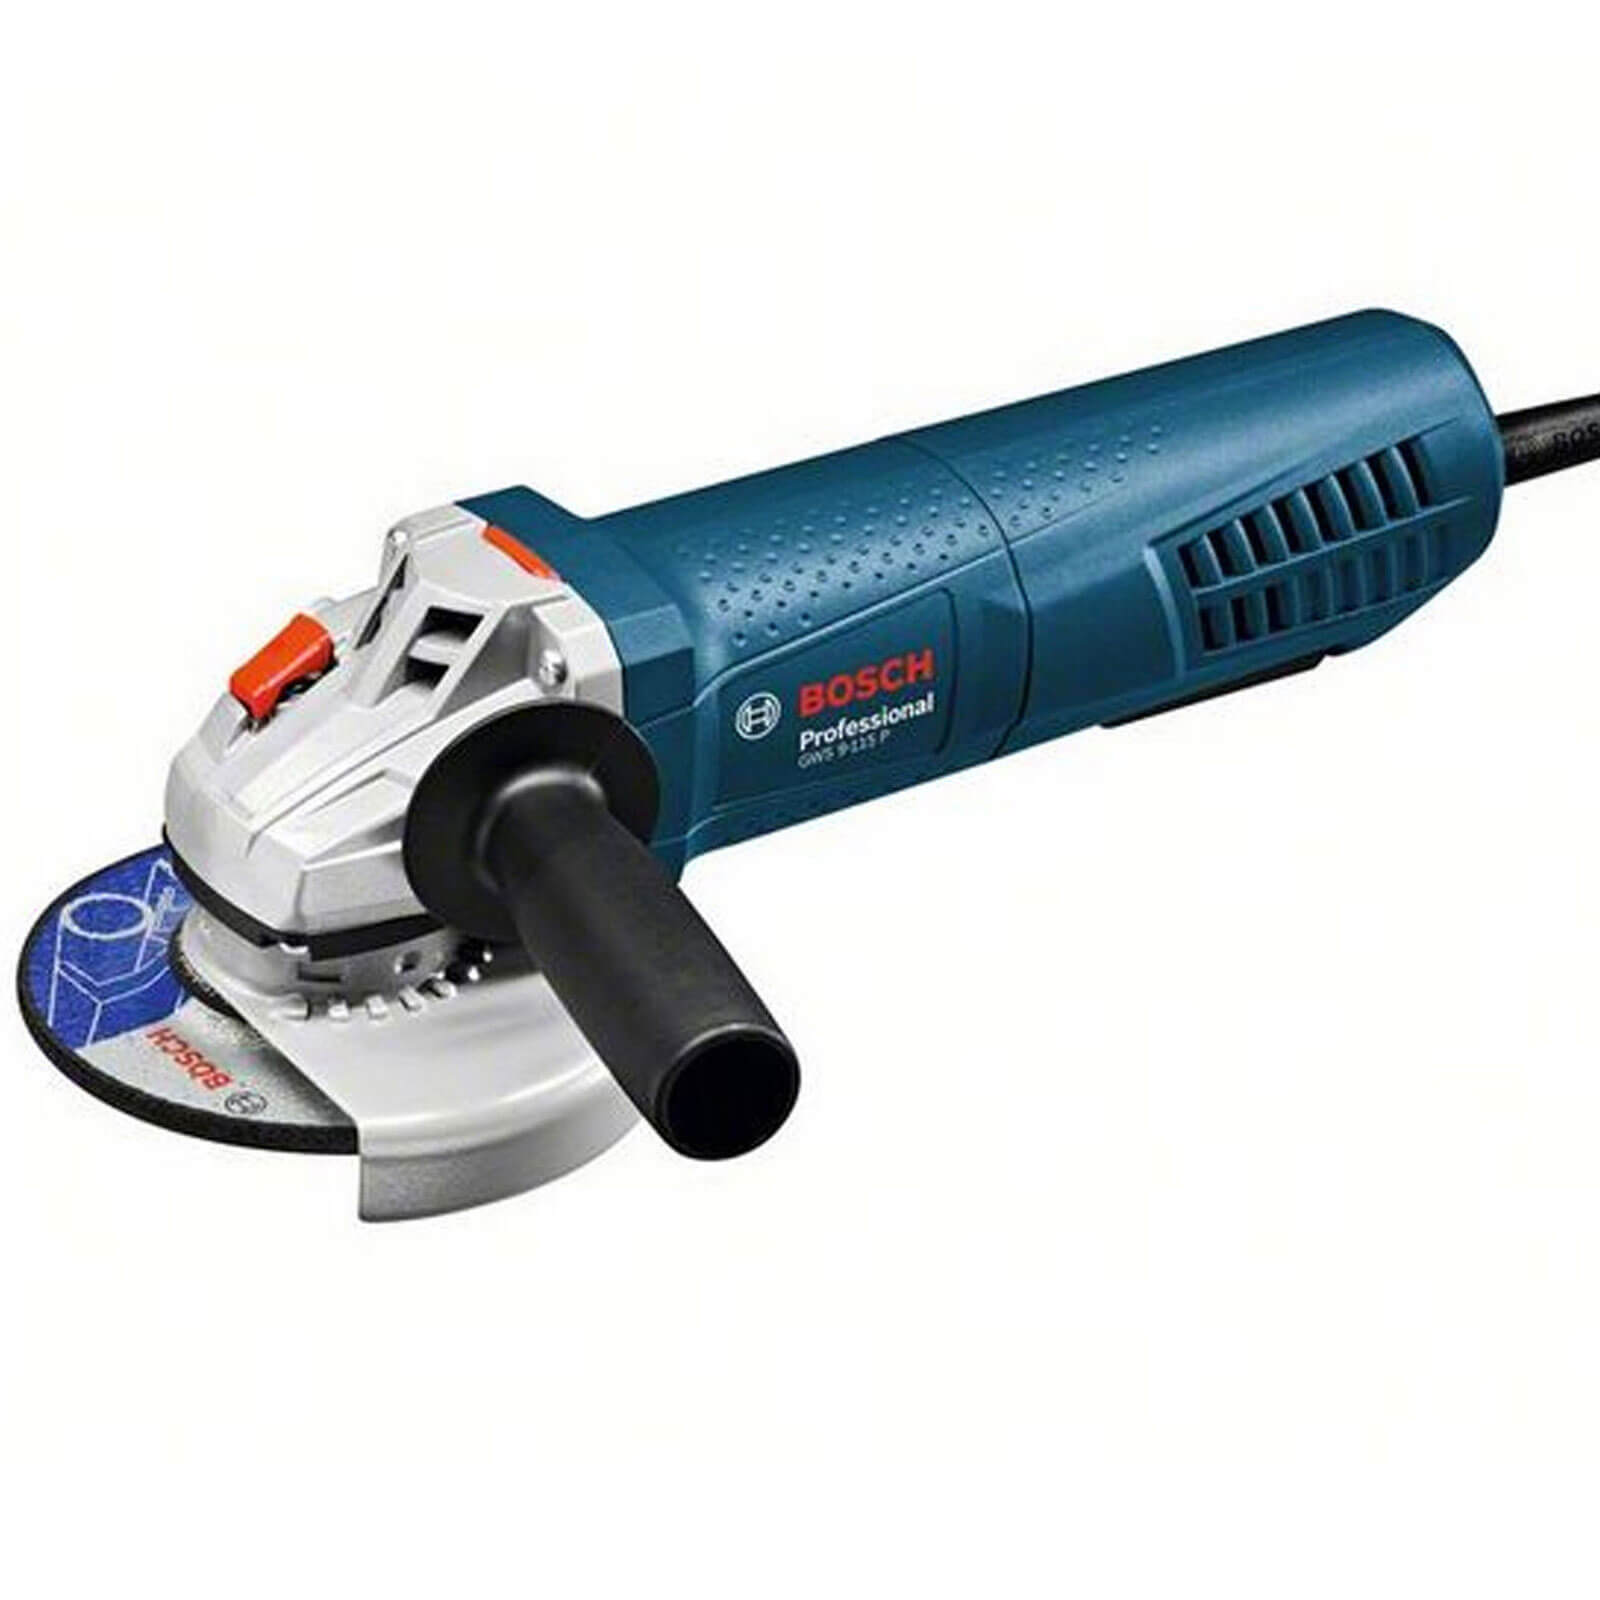 best bosch angle grinder prices in power tools online. Black Bedroom Furniture Sets. Home Design Ideas